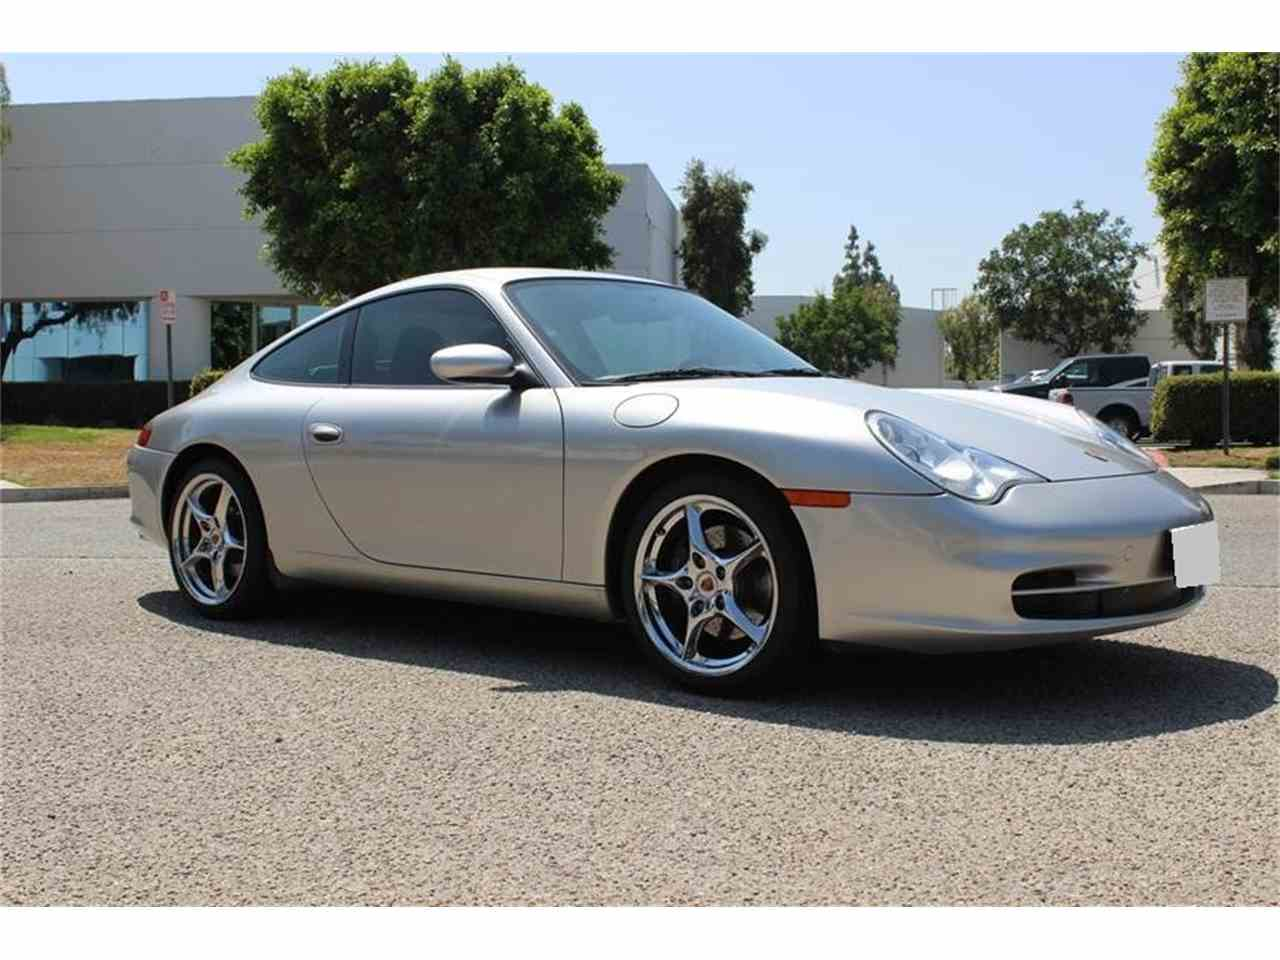 All Types 2003 911 : 2003 Porsche 911 Carrera for Sale | ClassicCars.com | CC-983951